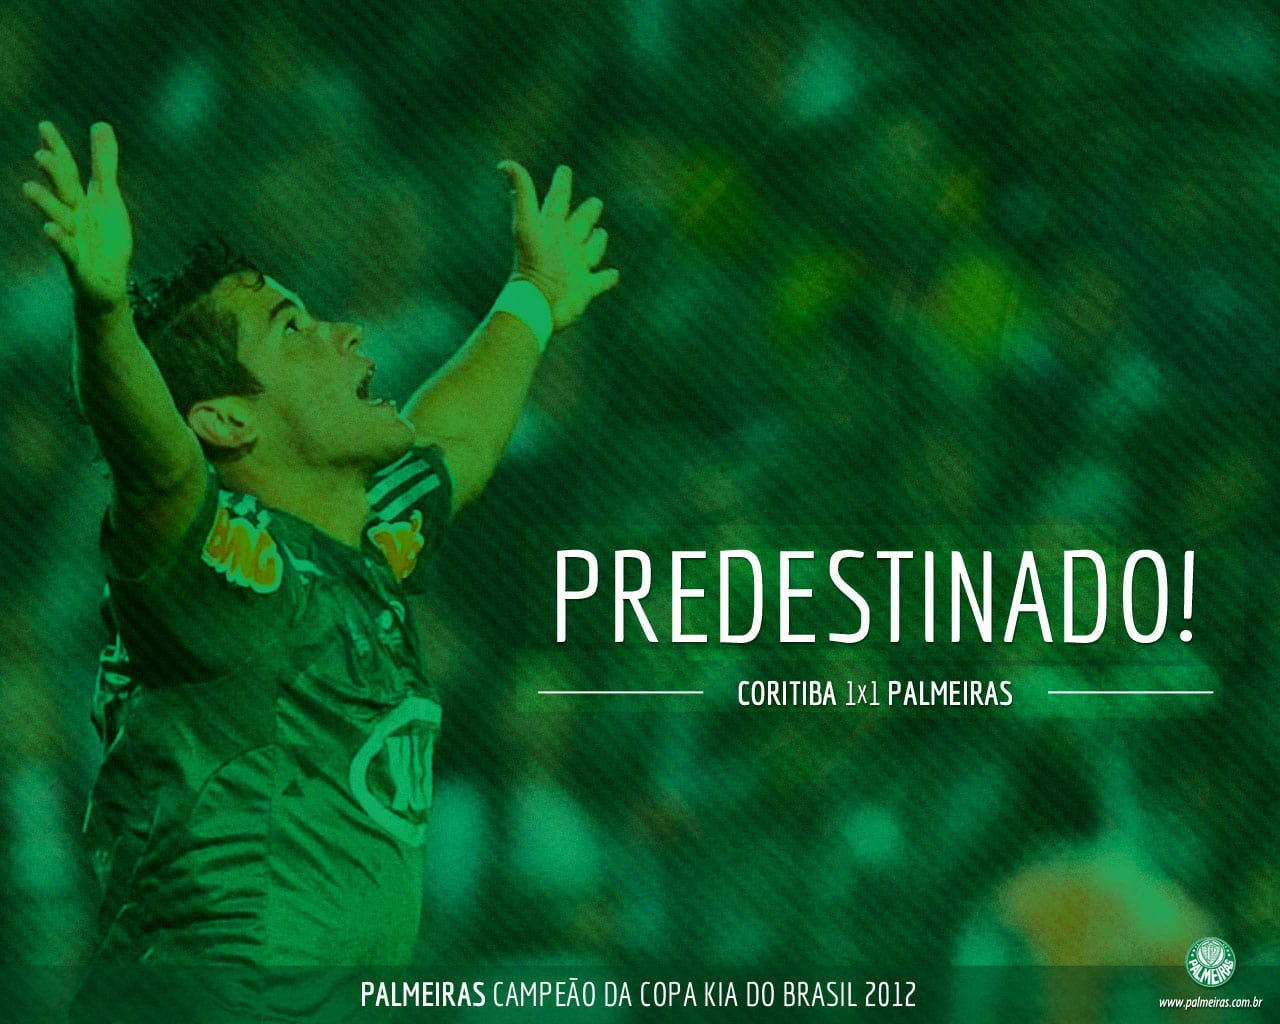 Papel de Parede do Palmeiras